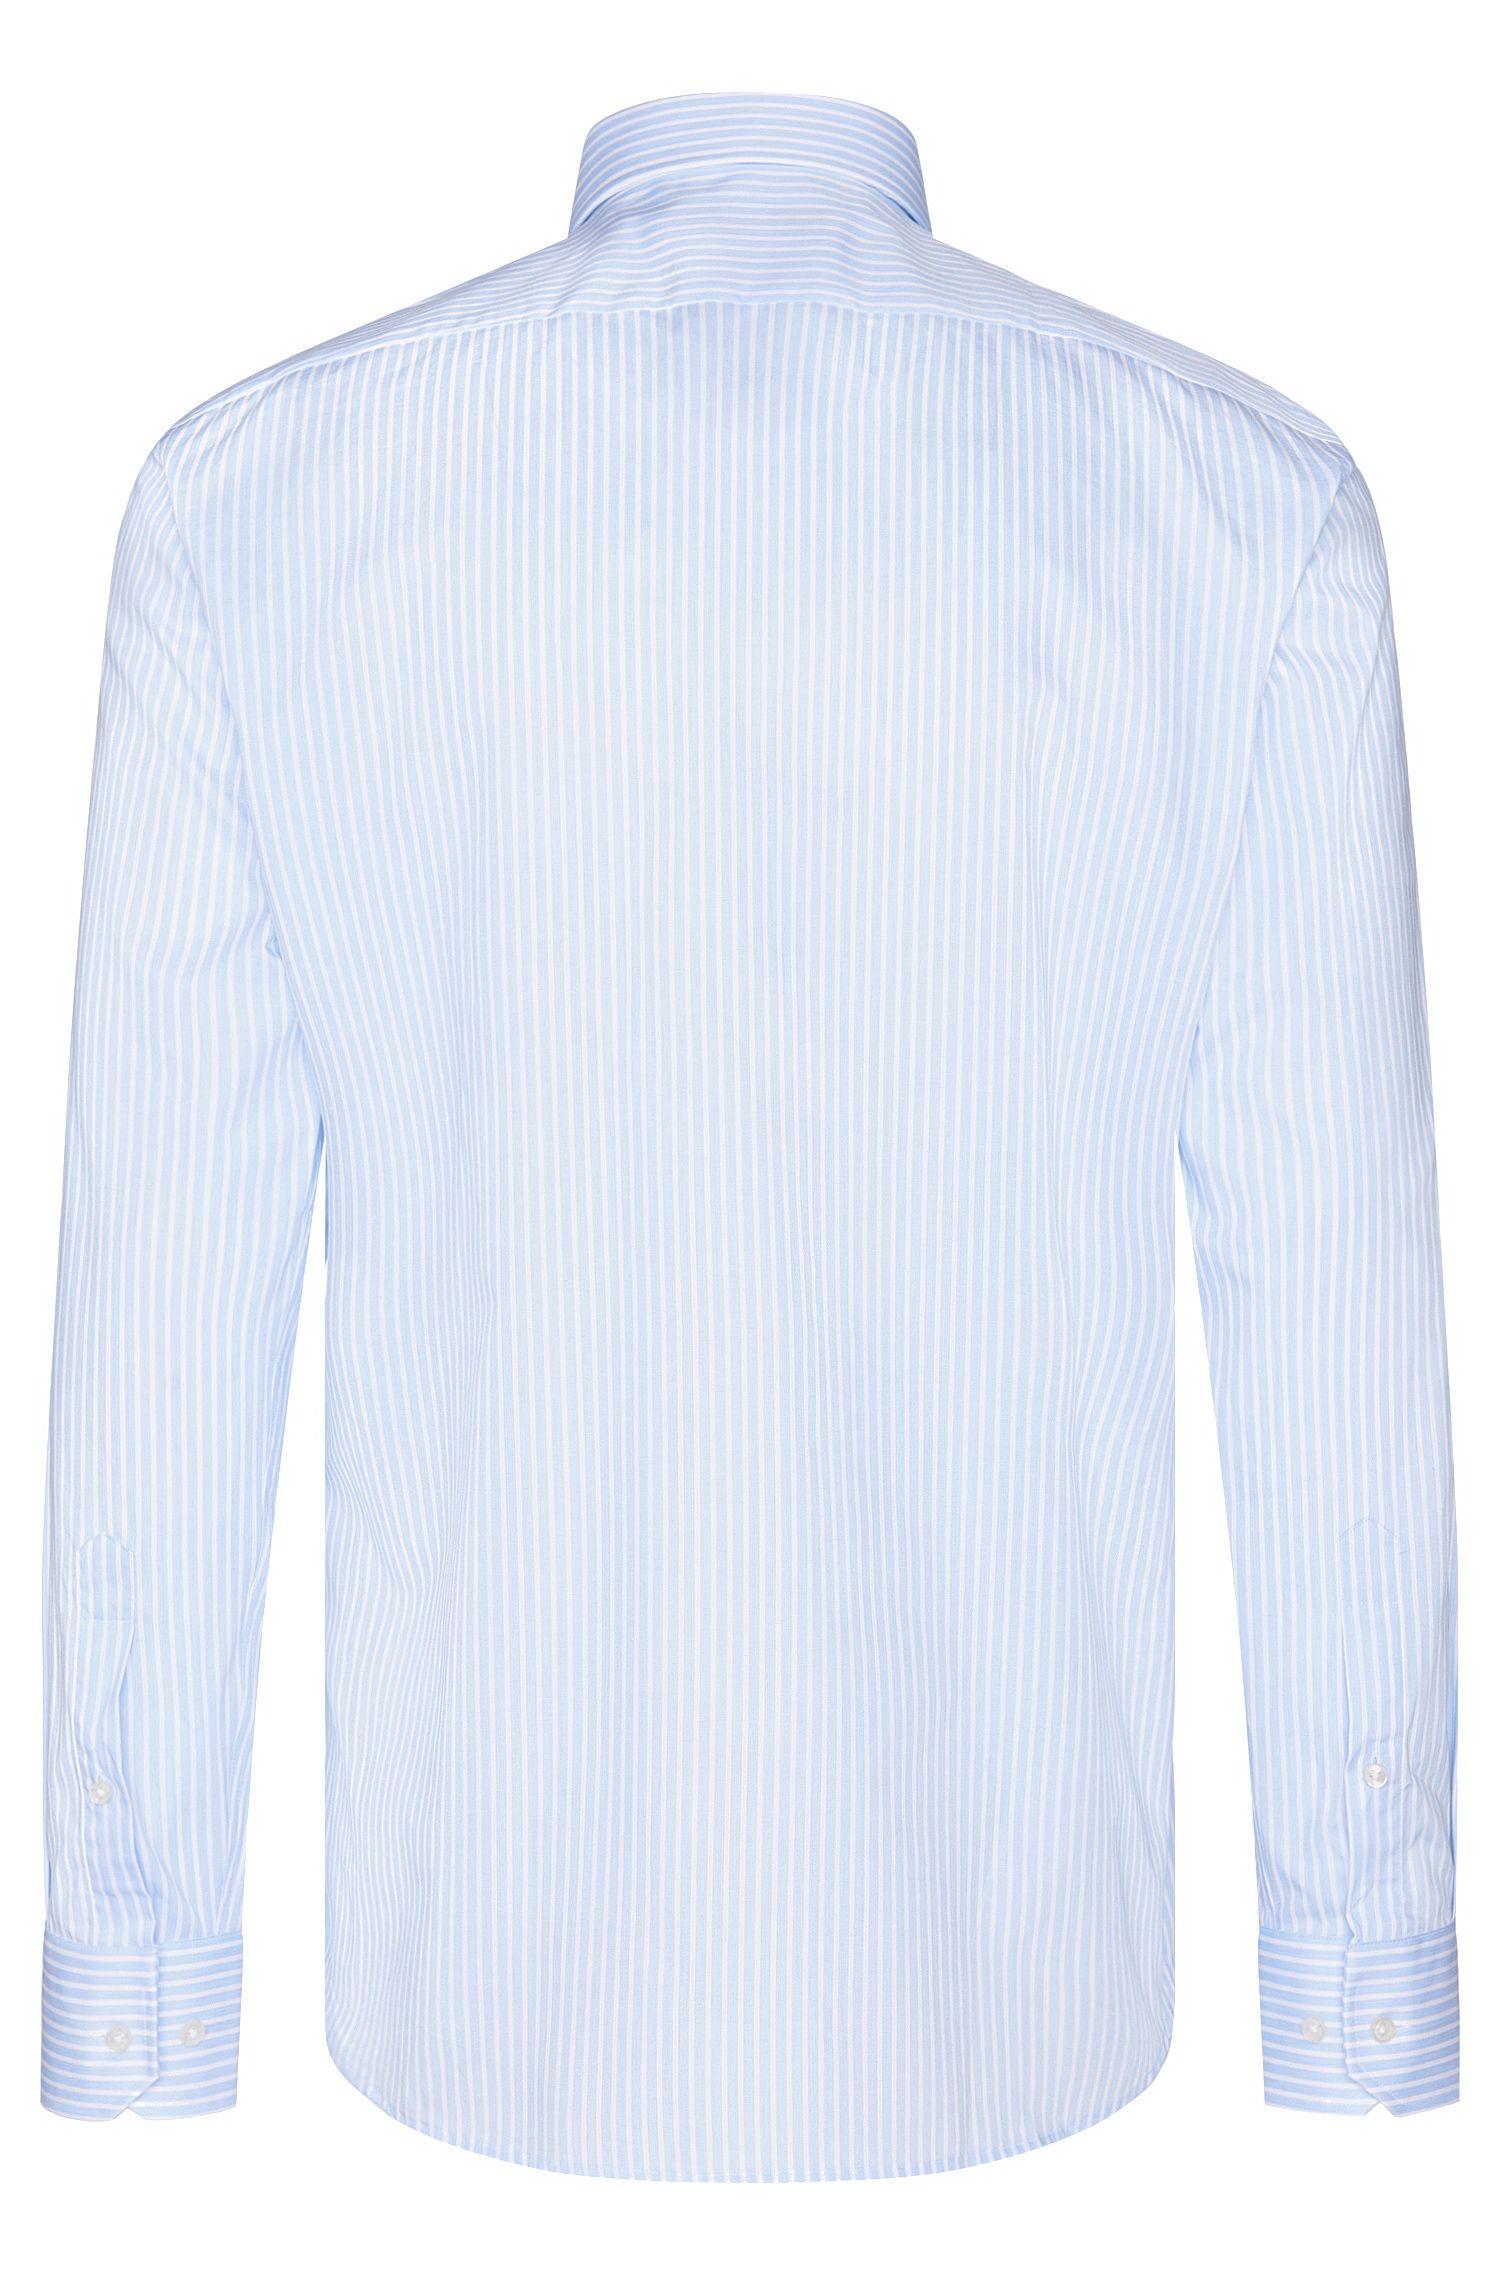 Striped Cotton Dress Shirt, Regular Fit | Enzo